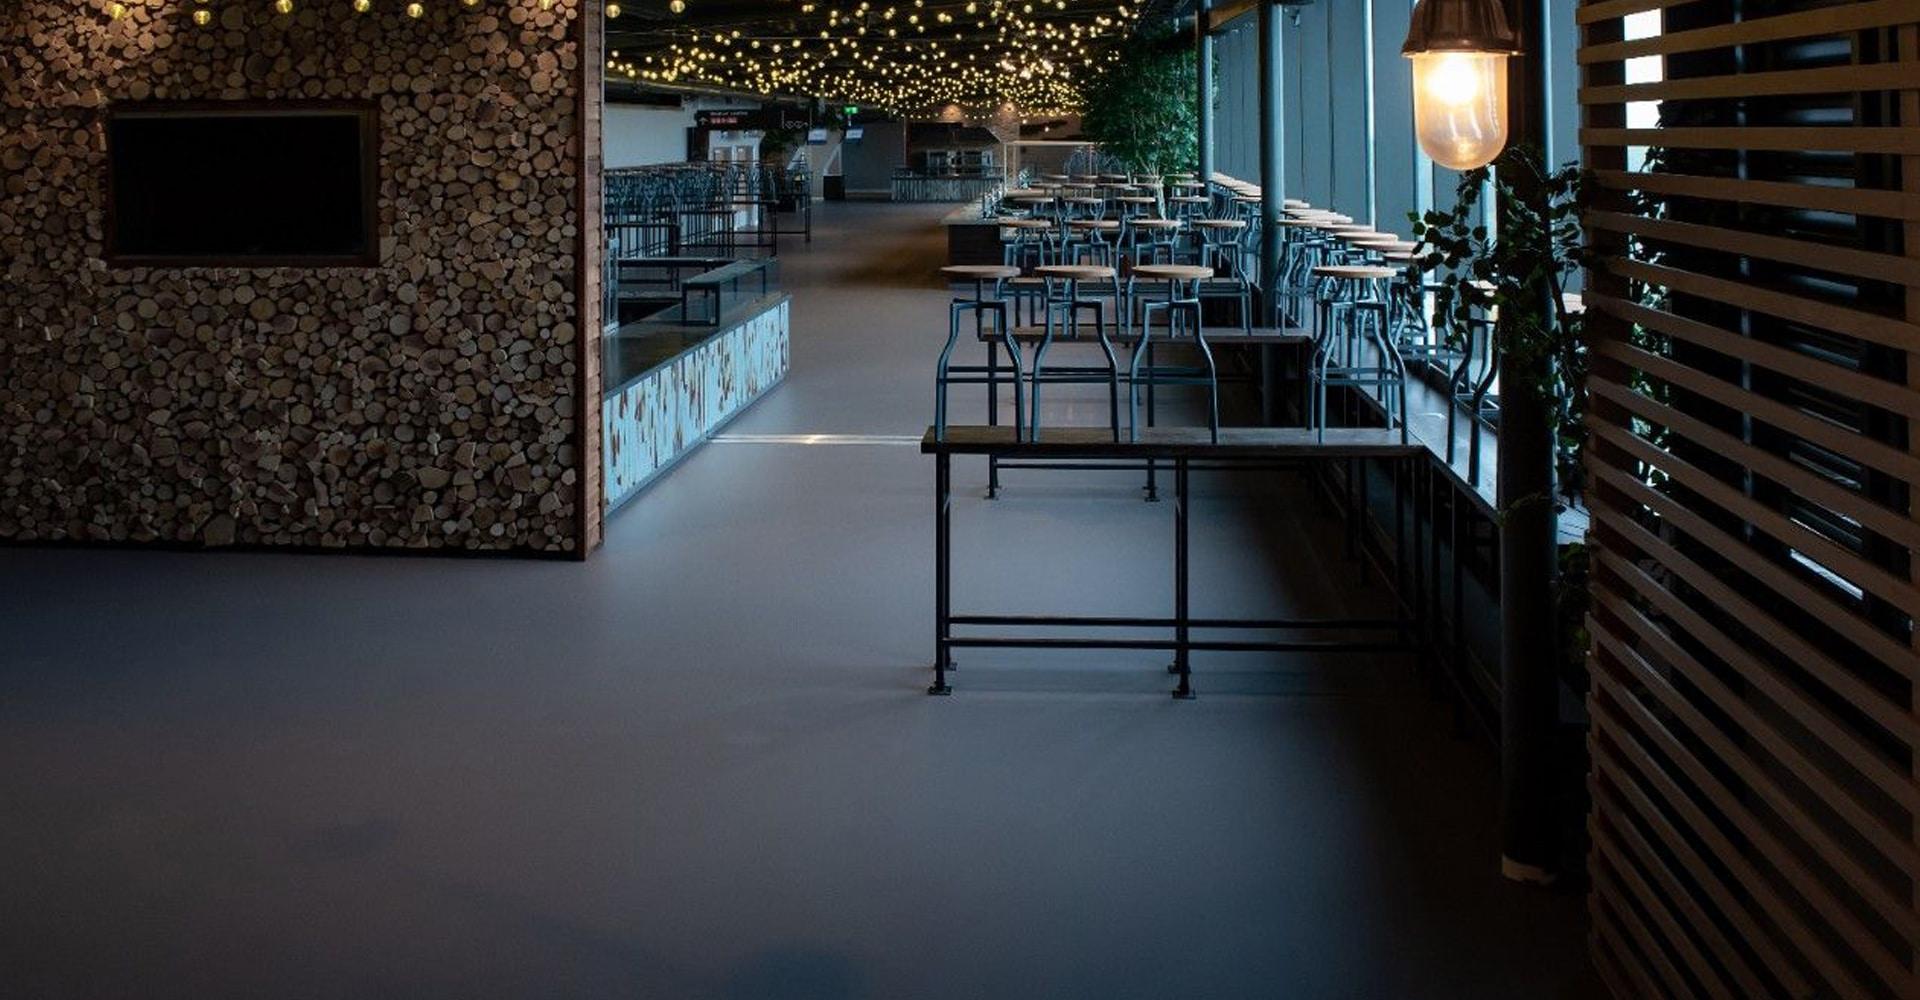 Horecavloer voor restaurant